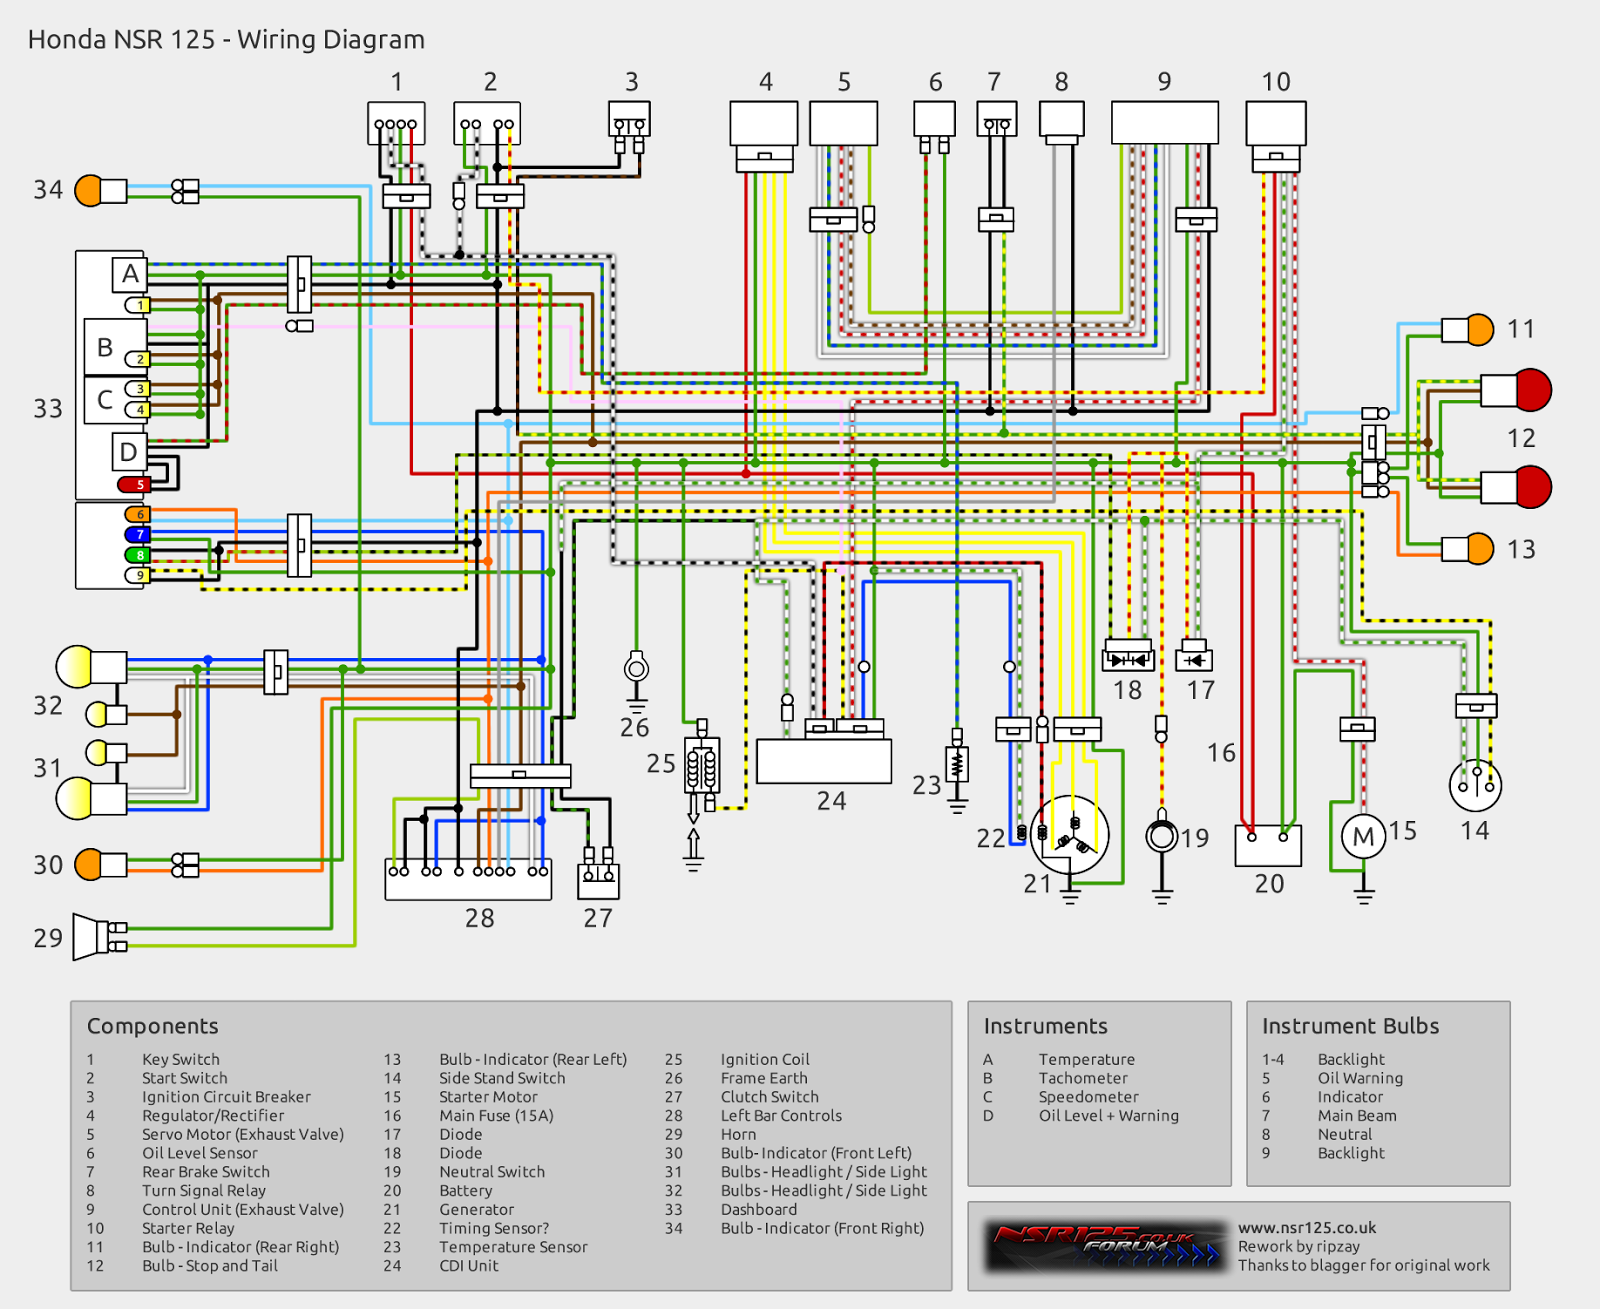 small resolution of nsr salatiga wiring diagram honda nsr series rh nsrsalatiga blogspot com honda cbr1100xx honda cg125